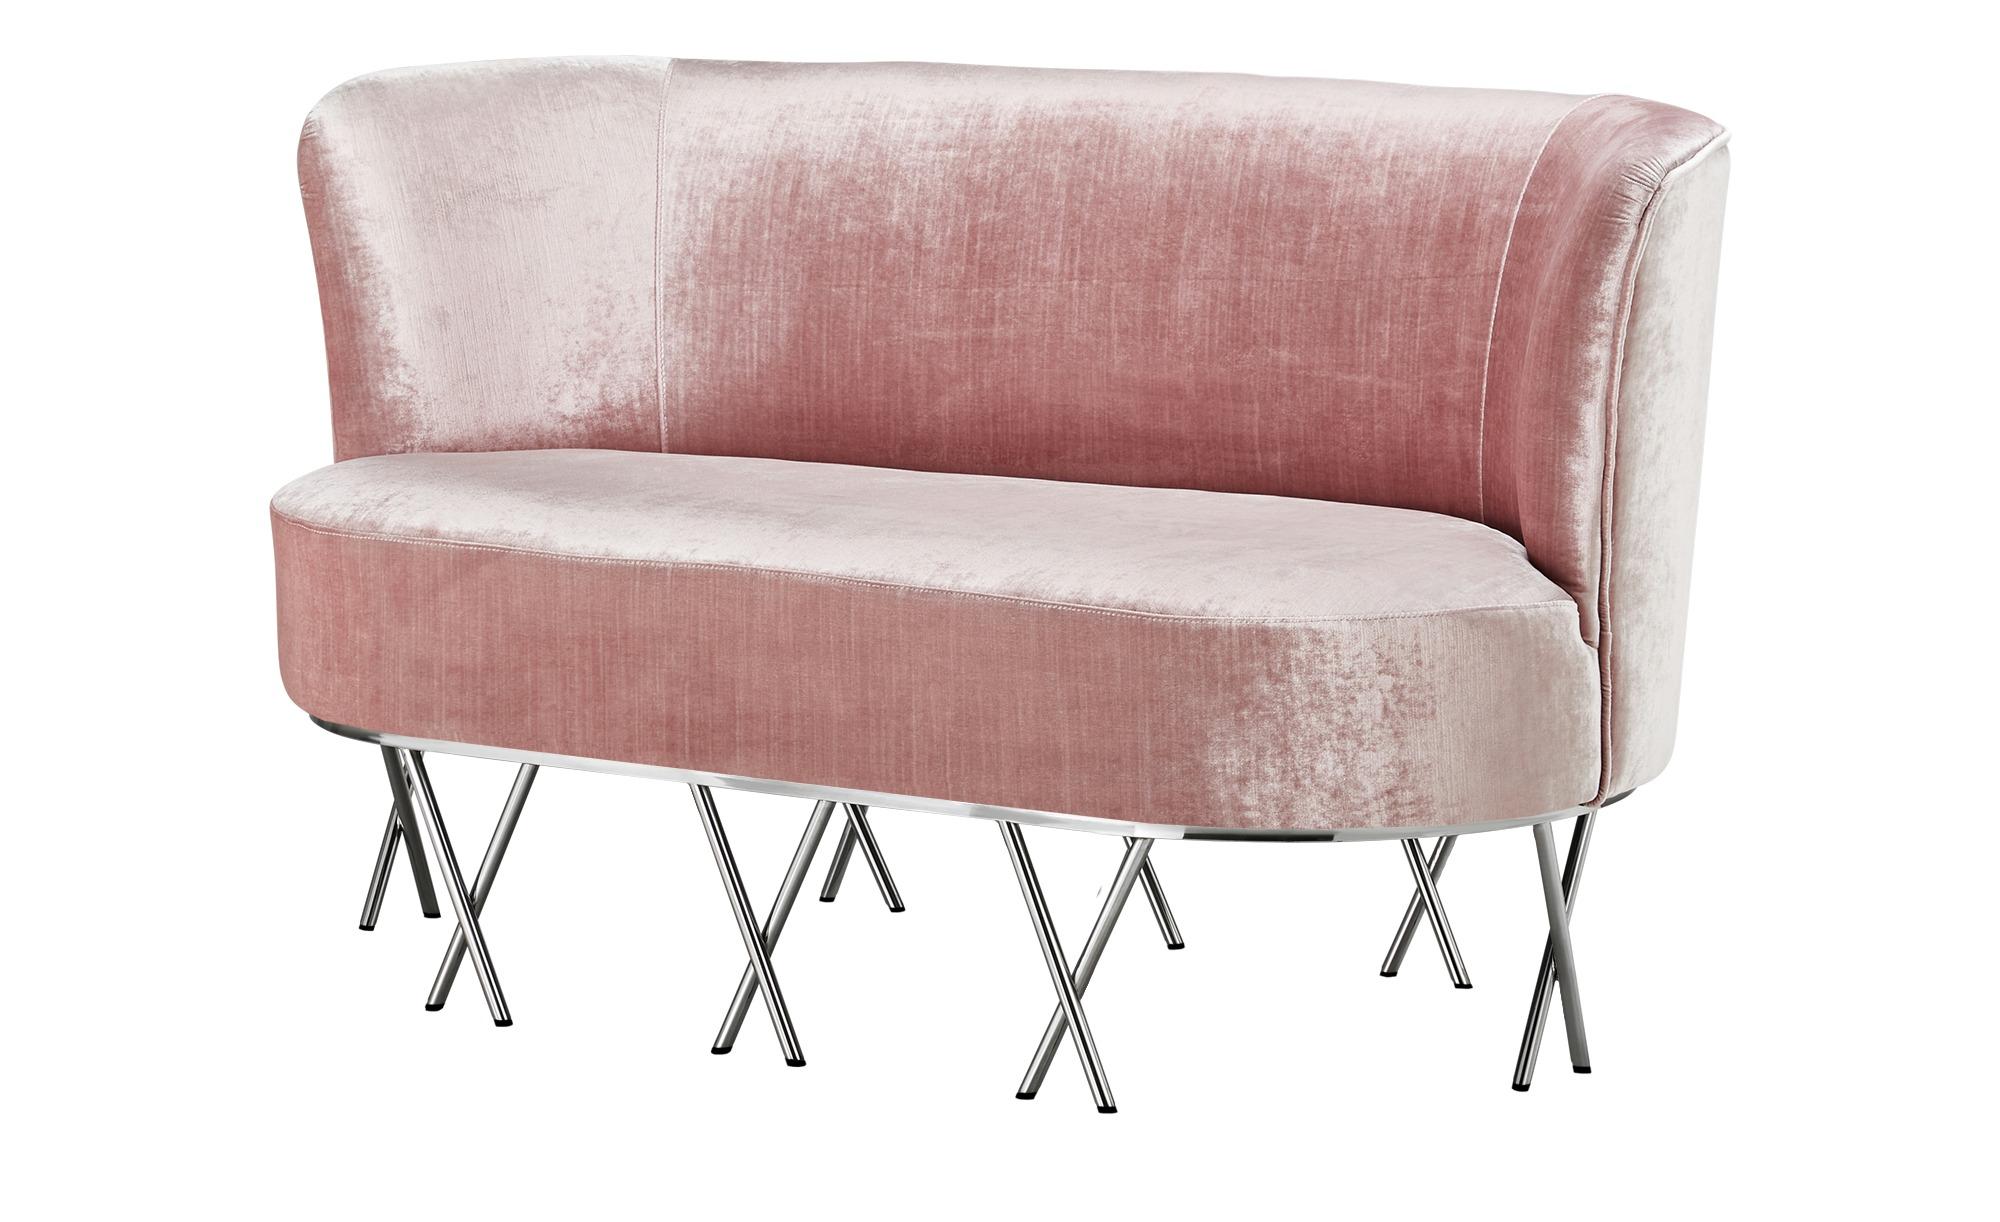 Sofa  Scarlett ¦ rosa/pink ¦ Maße (cm): B: 145 H: 72 T: 80 Polstermöbel > Sofas > 2-Sitzer - Höffner